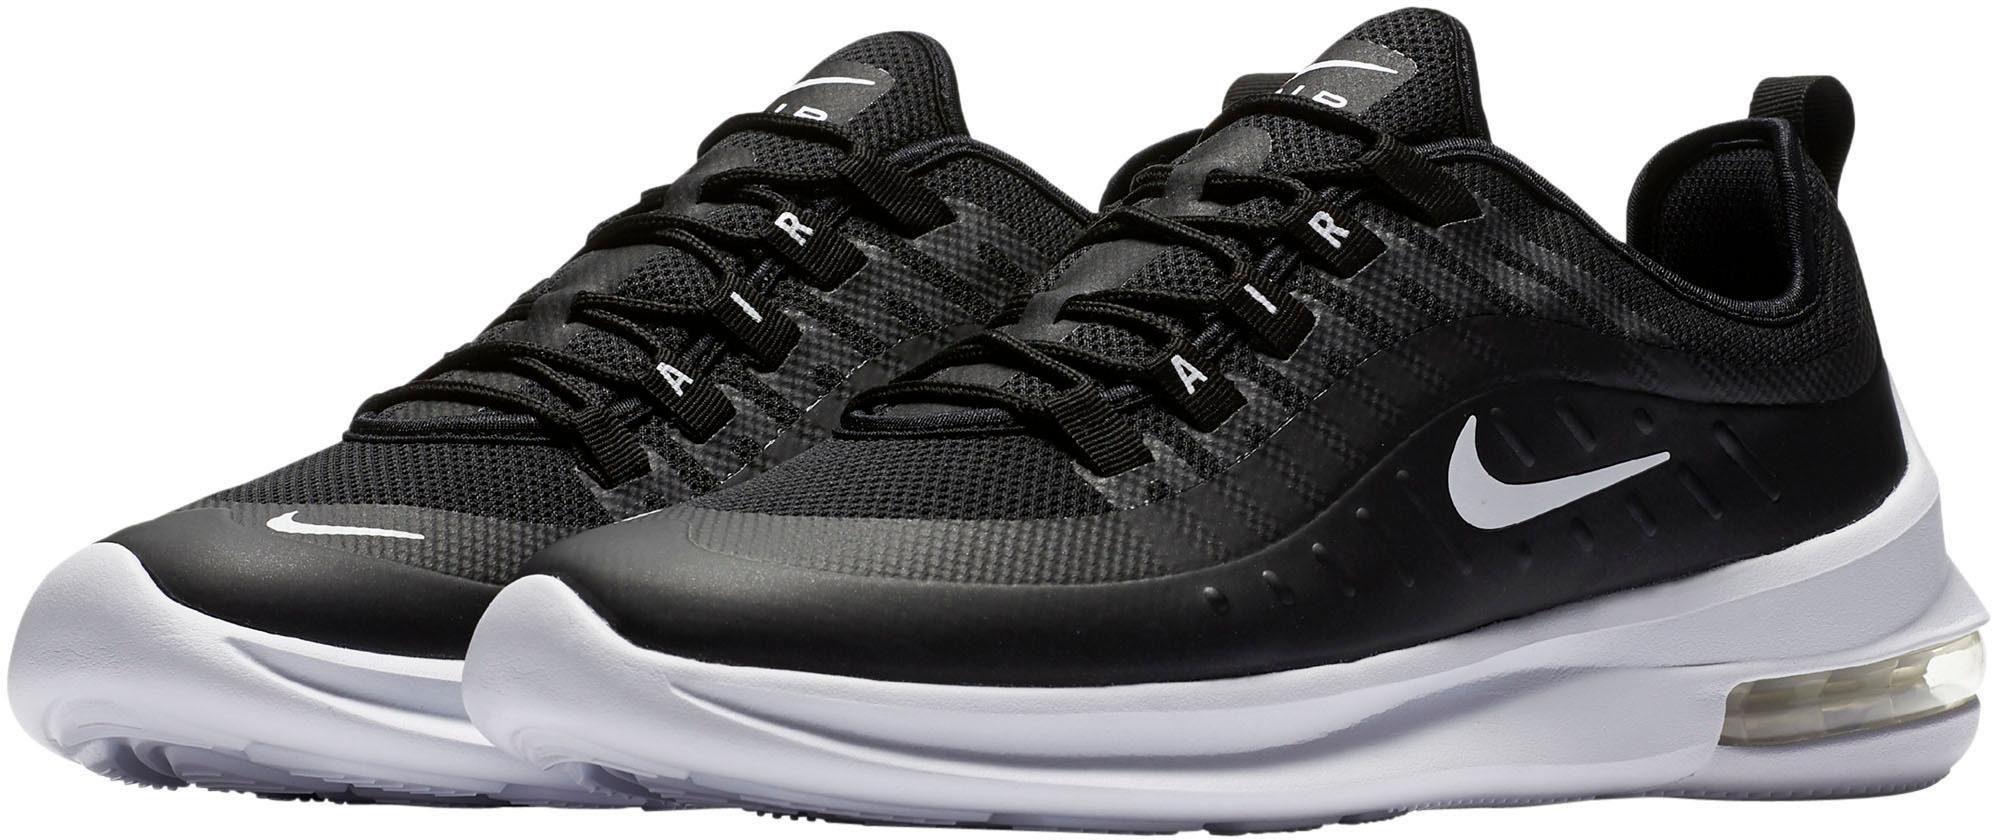 Nike Sportswear »Air Max Axis« Sneaker, Moderner Sneaker von Nike Sportswear online kaufen | OTTO